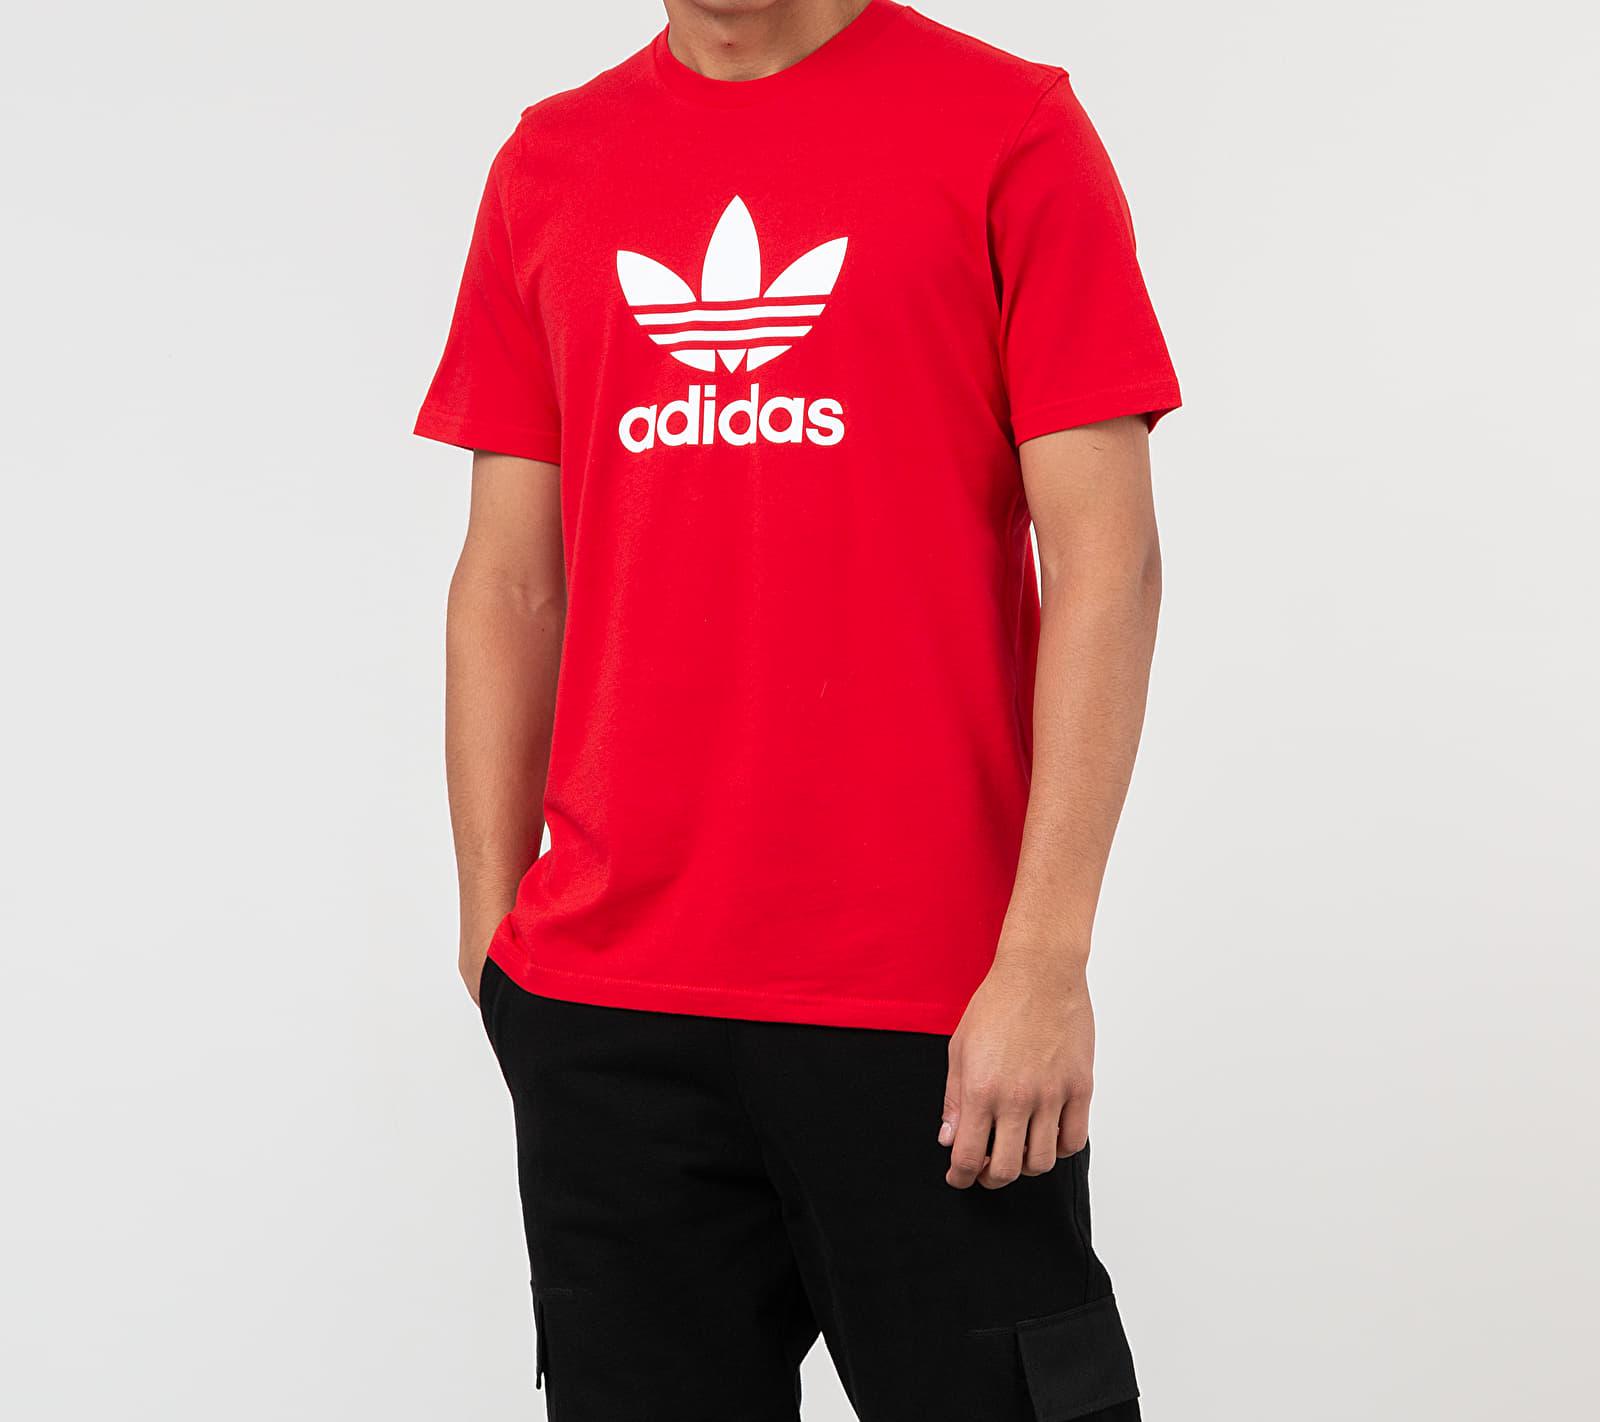 adidas Trefoil Tee Red/ White S